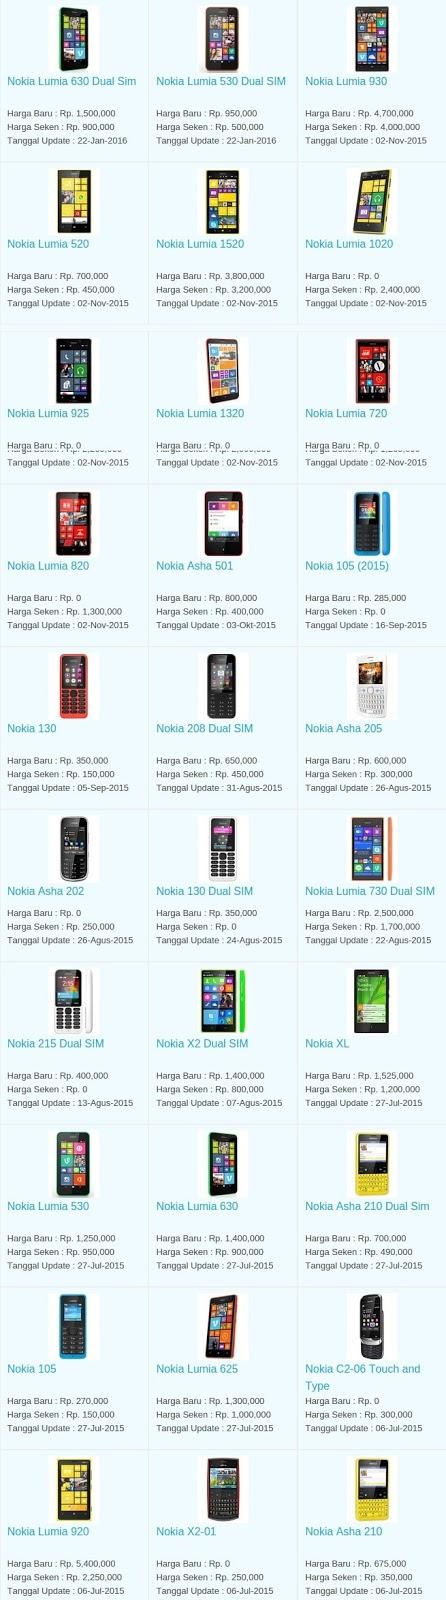 Harga Hp Terbaru Nokia Agustus 2016